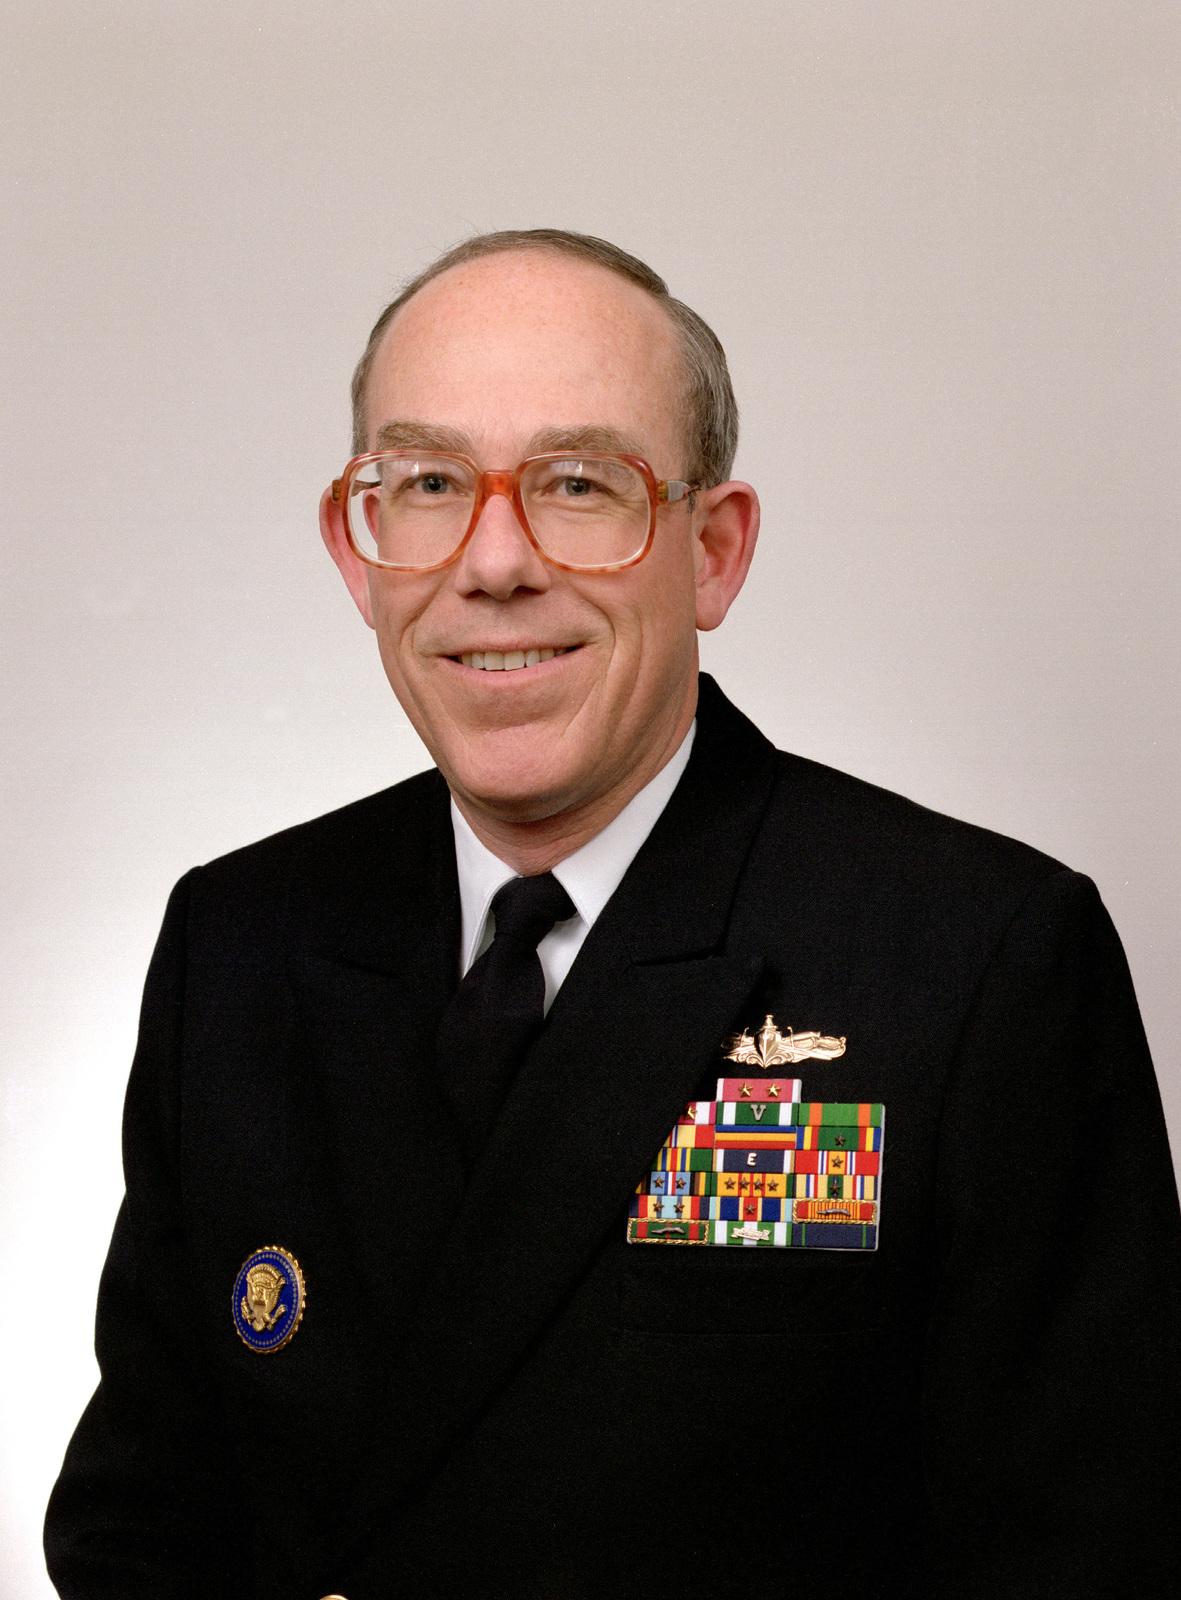 William R. Schmidt, USN (1994 Rear Admiral Selectee)